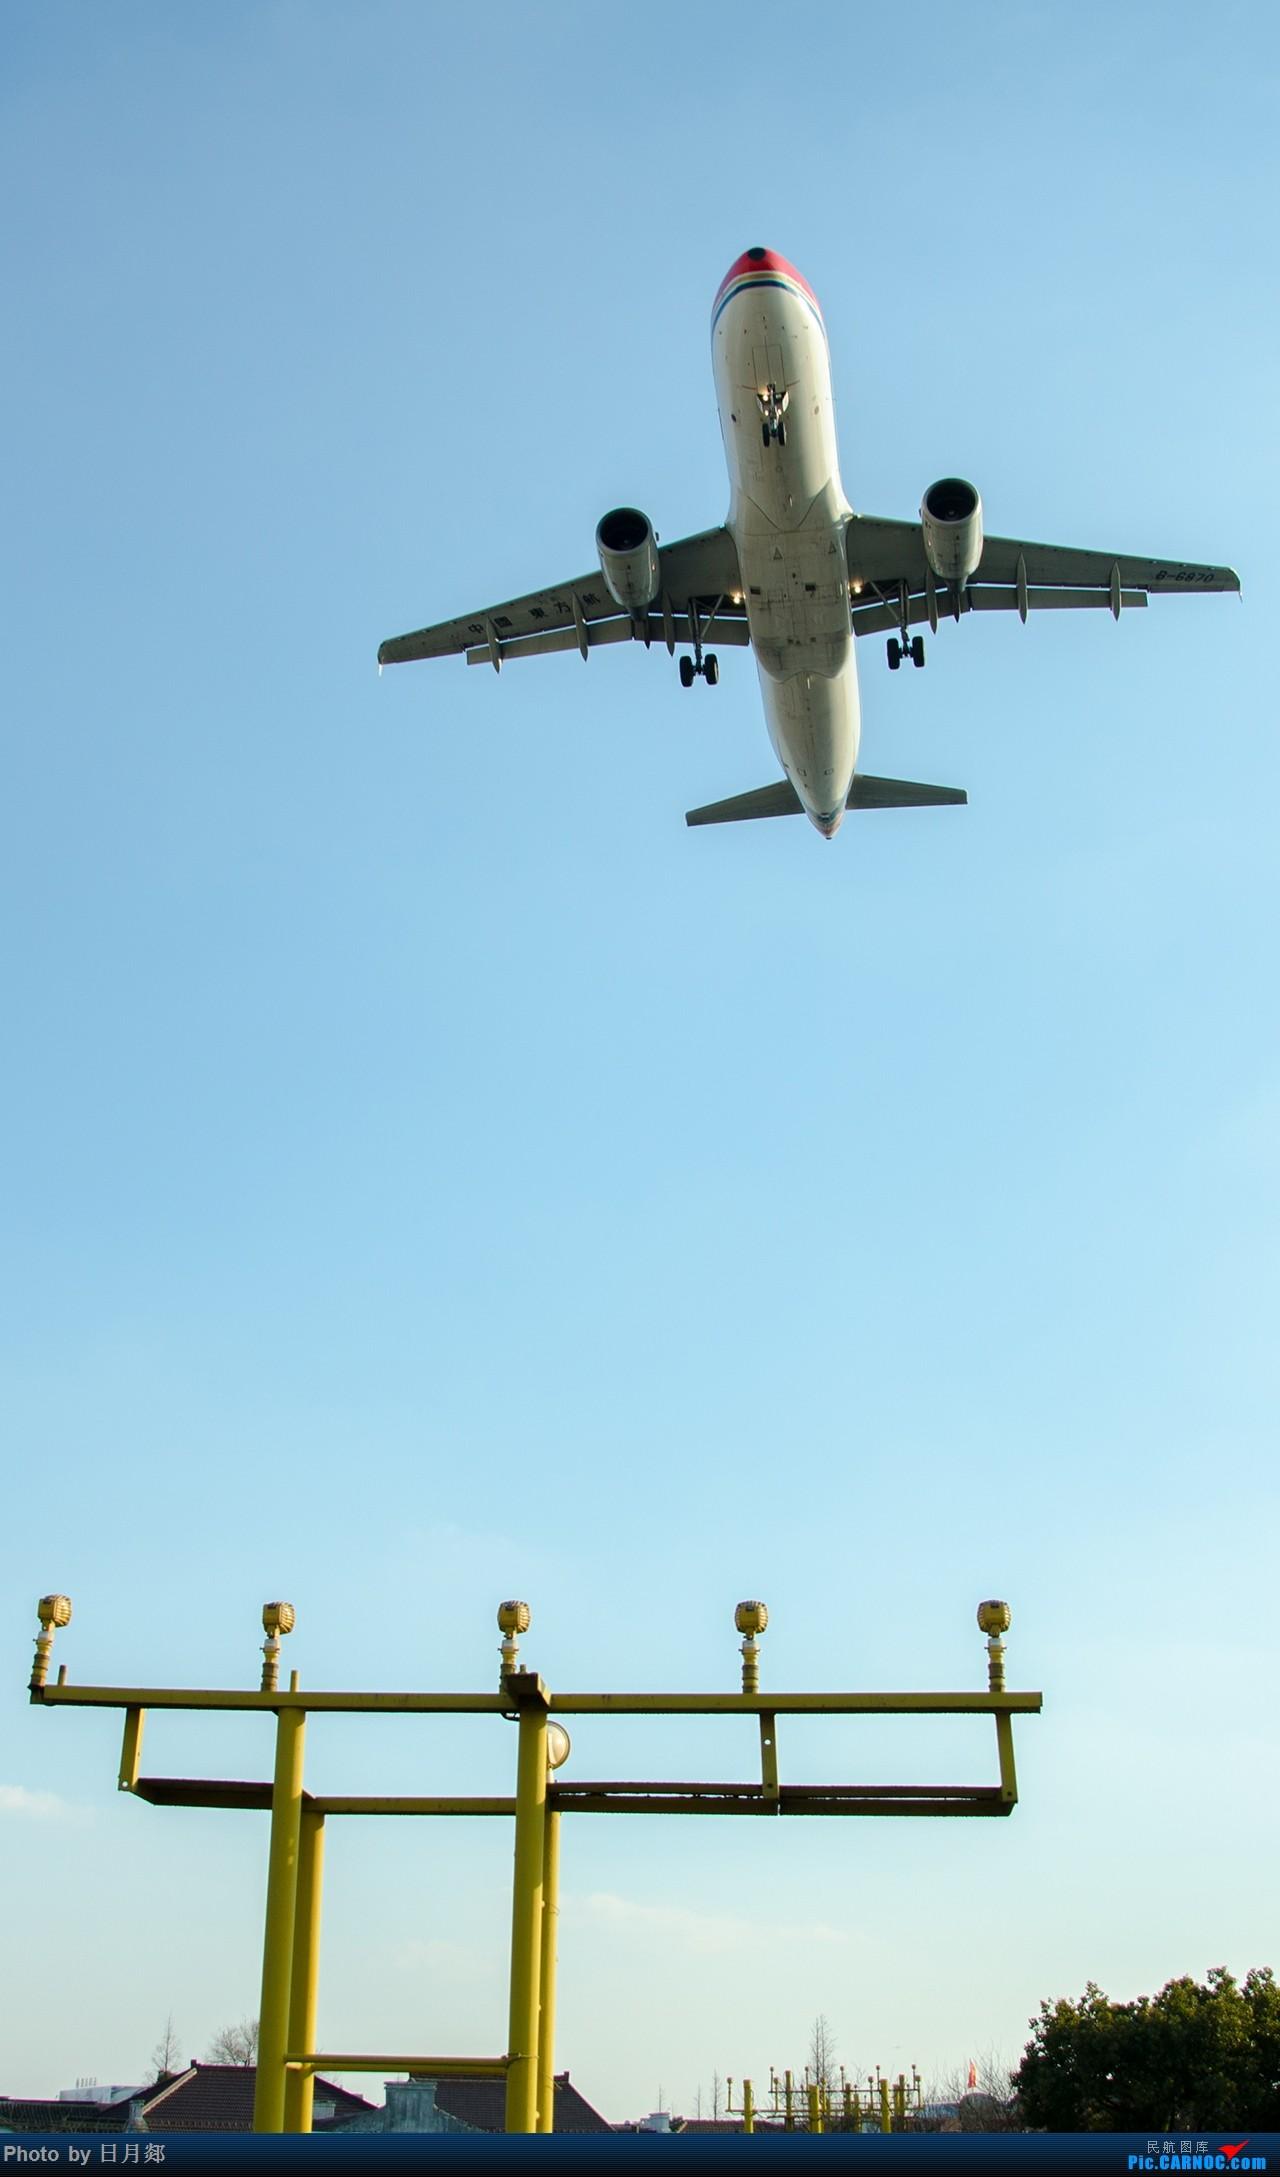 Re:[原创]首次发图,虹桥杂图,二月的某一个好天气 AIRBUS A320-200 B-6870 中国上海虹桥国际机场